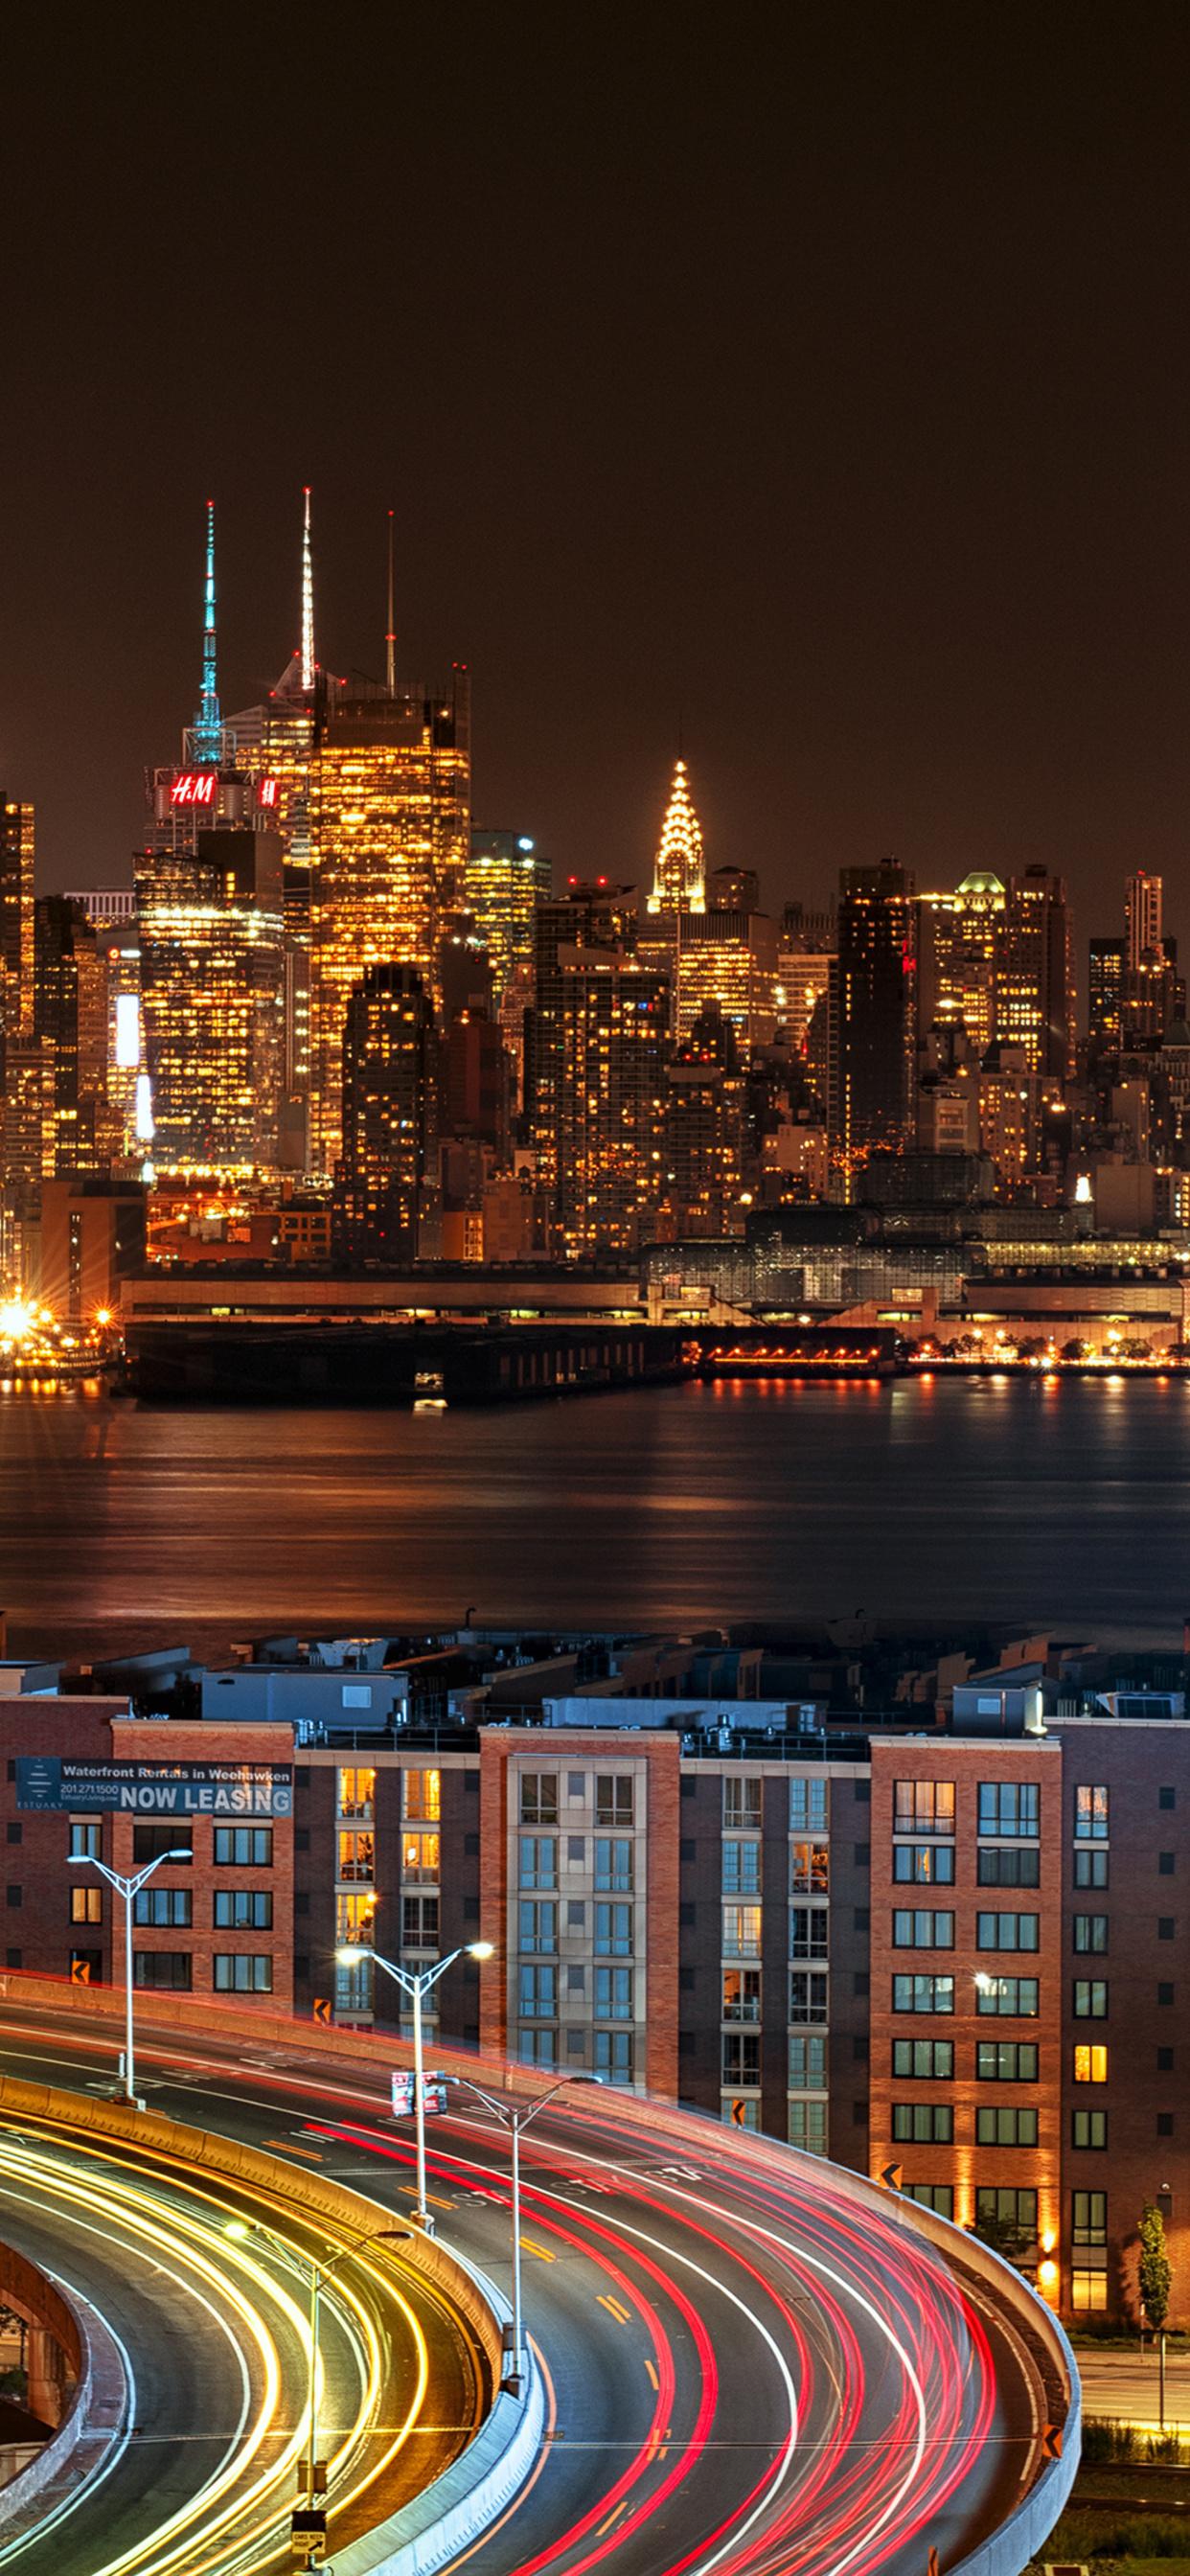 Top New York City Iphone Xs Max Wallpaper - wallpaper